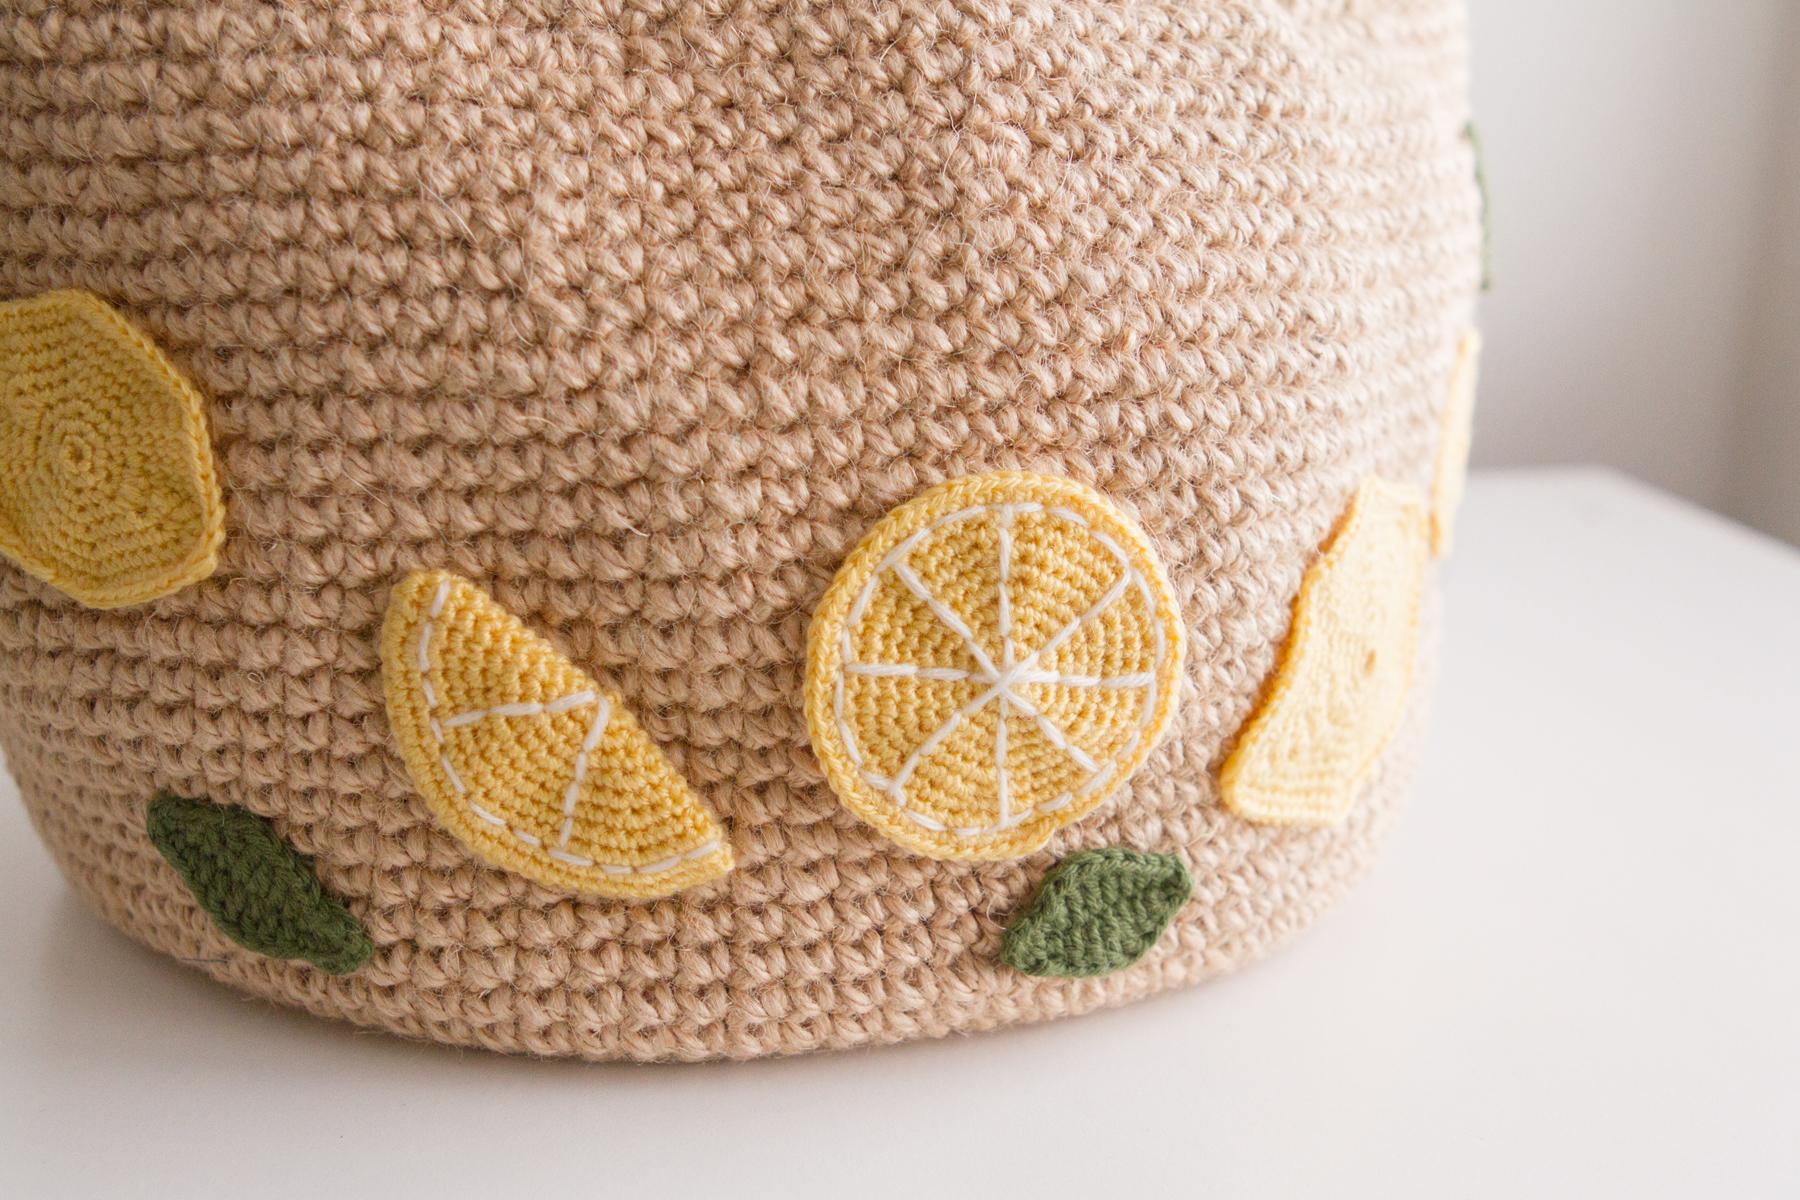 Crocheted lemons slices up close